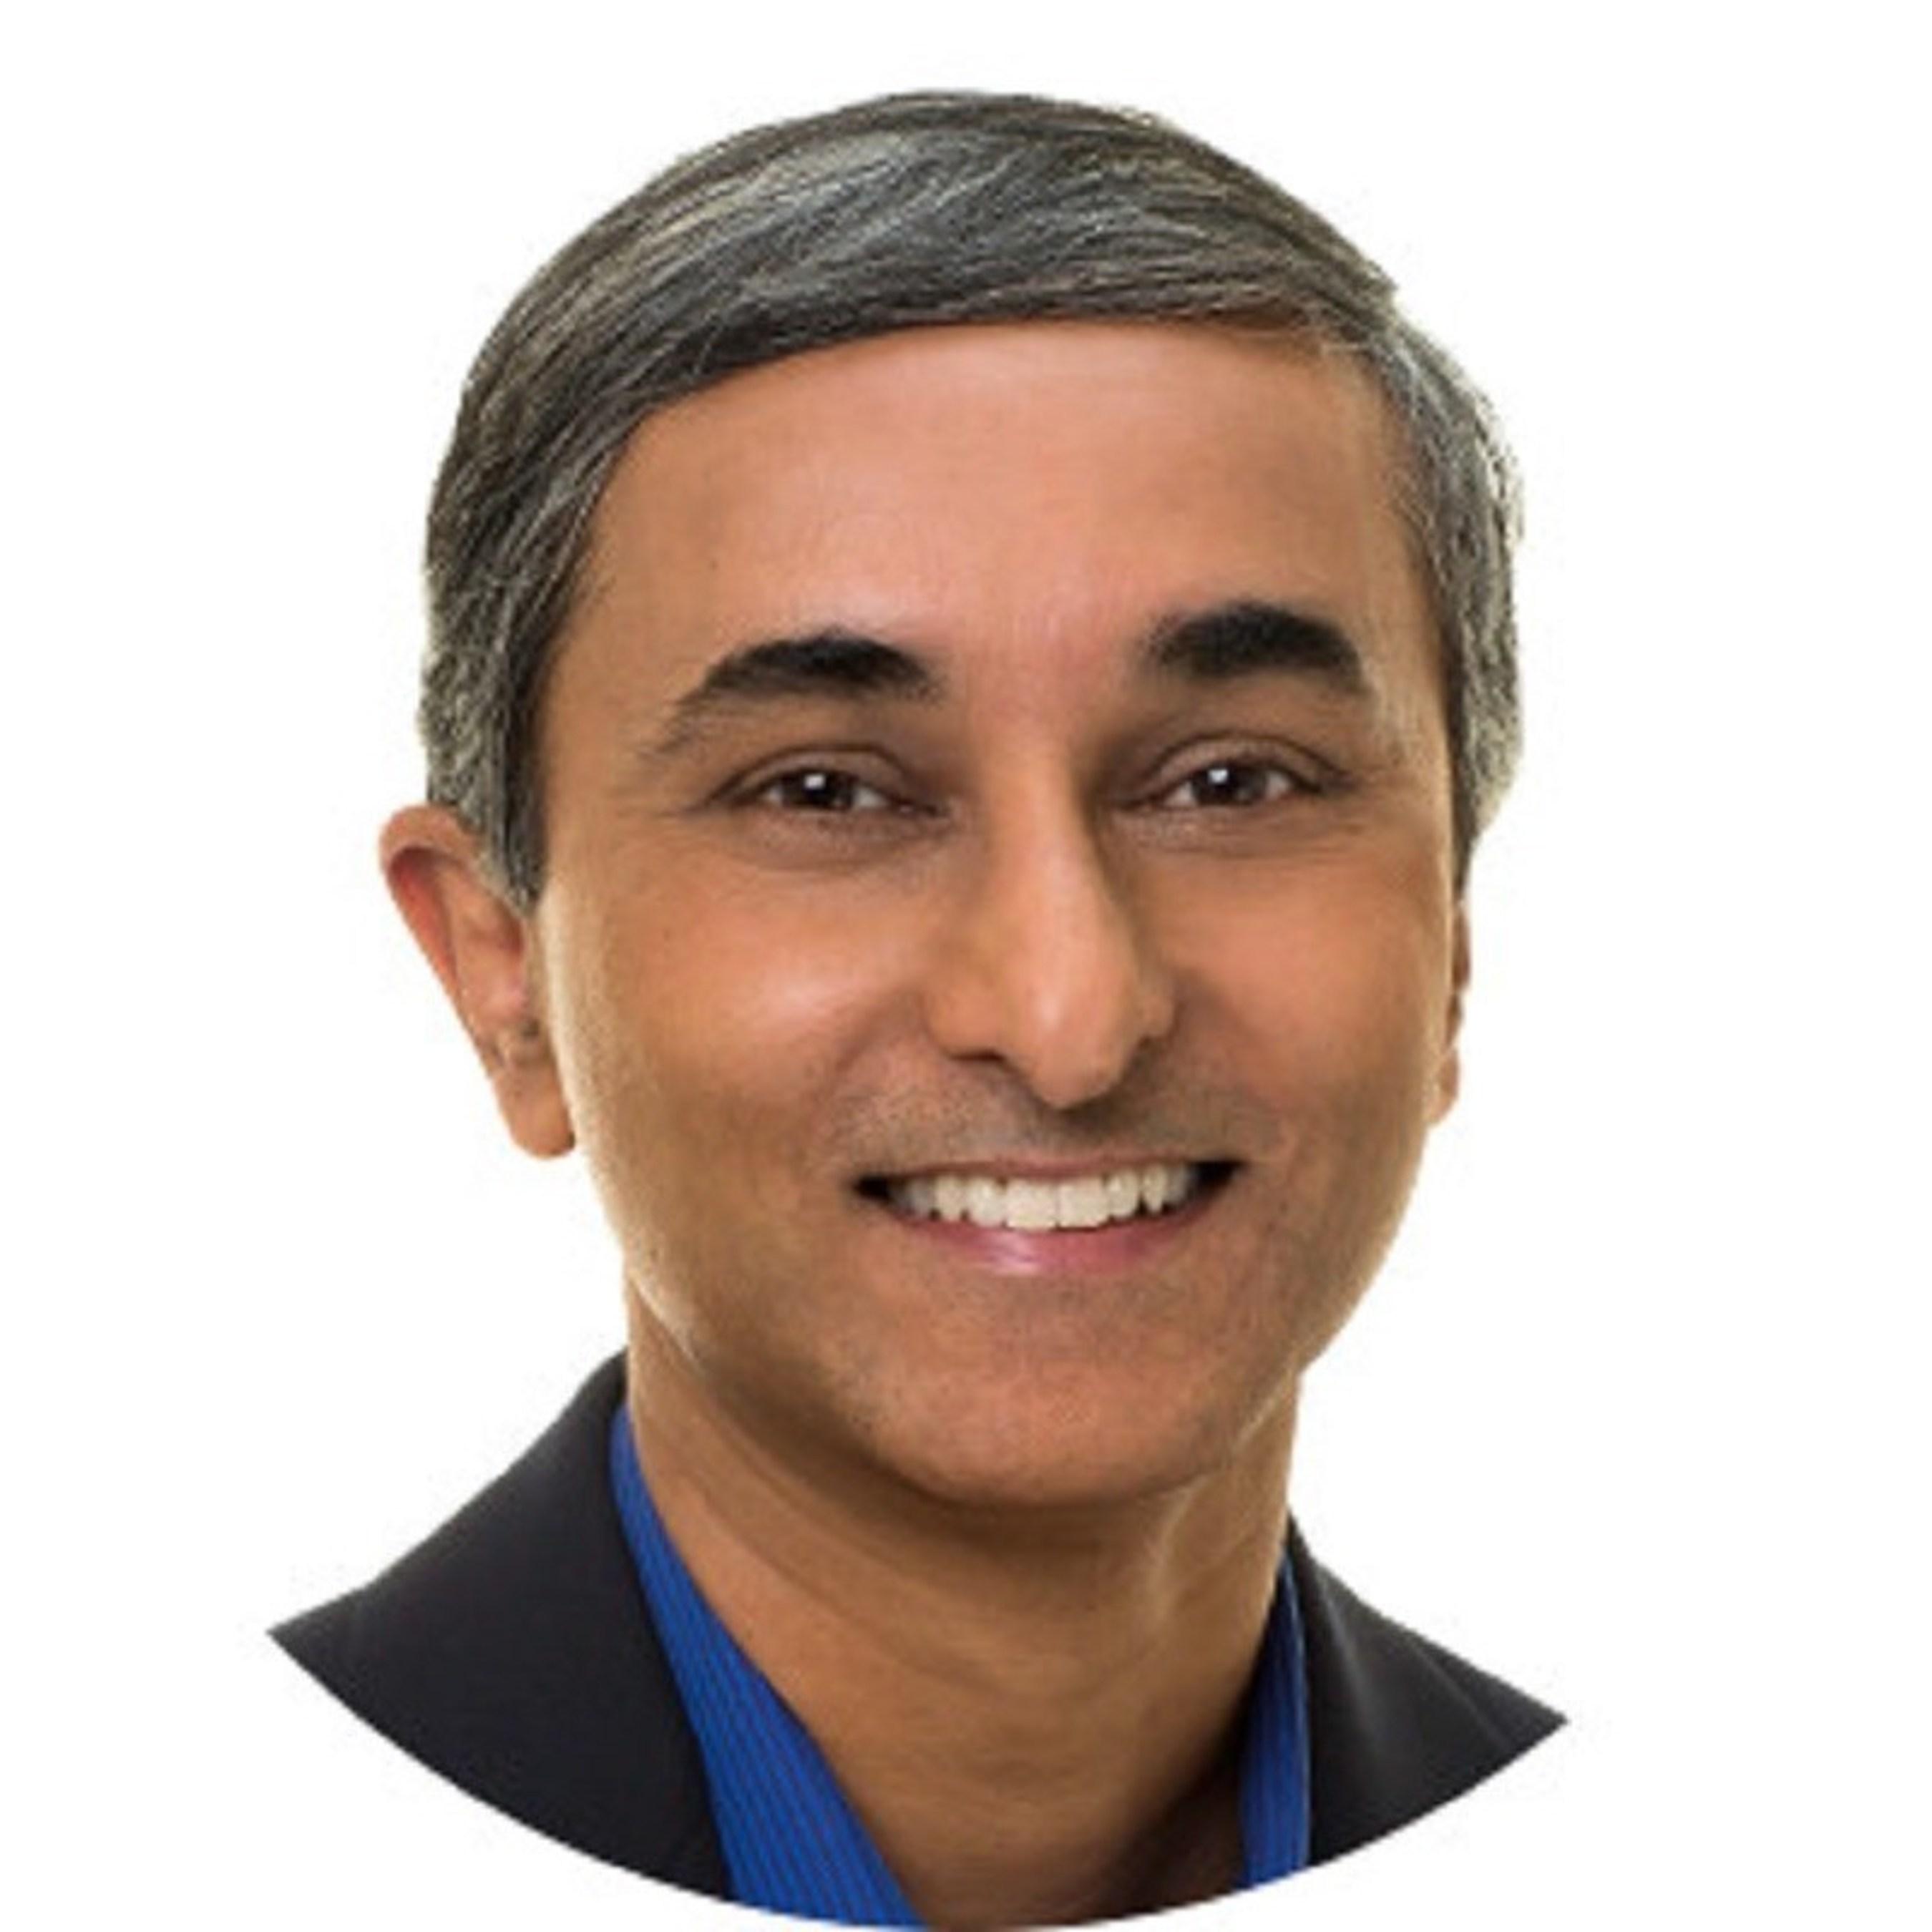 Rajat Mukherjee, CTO of Quixey